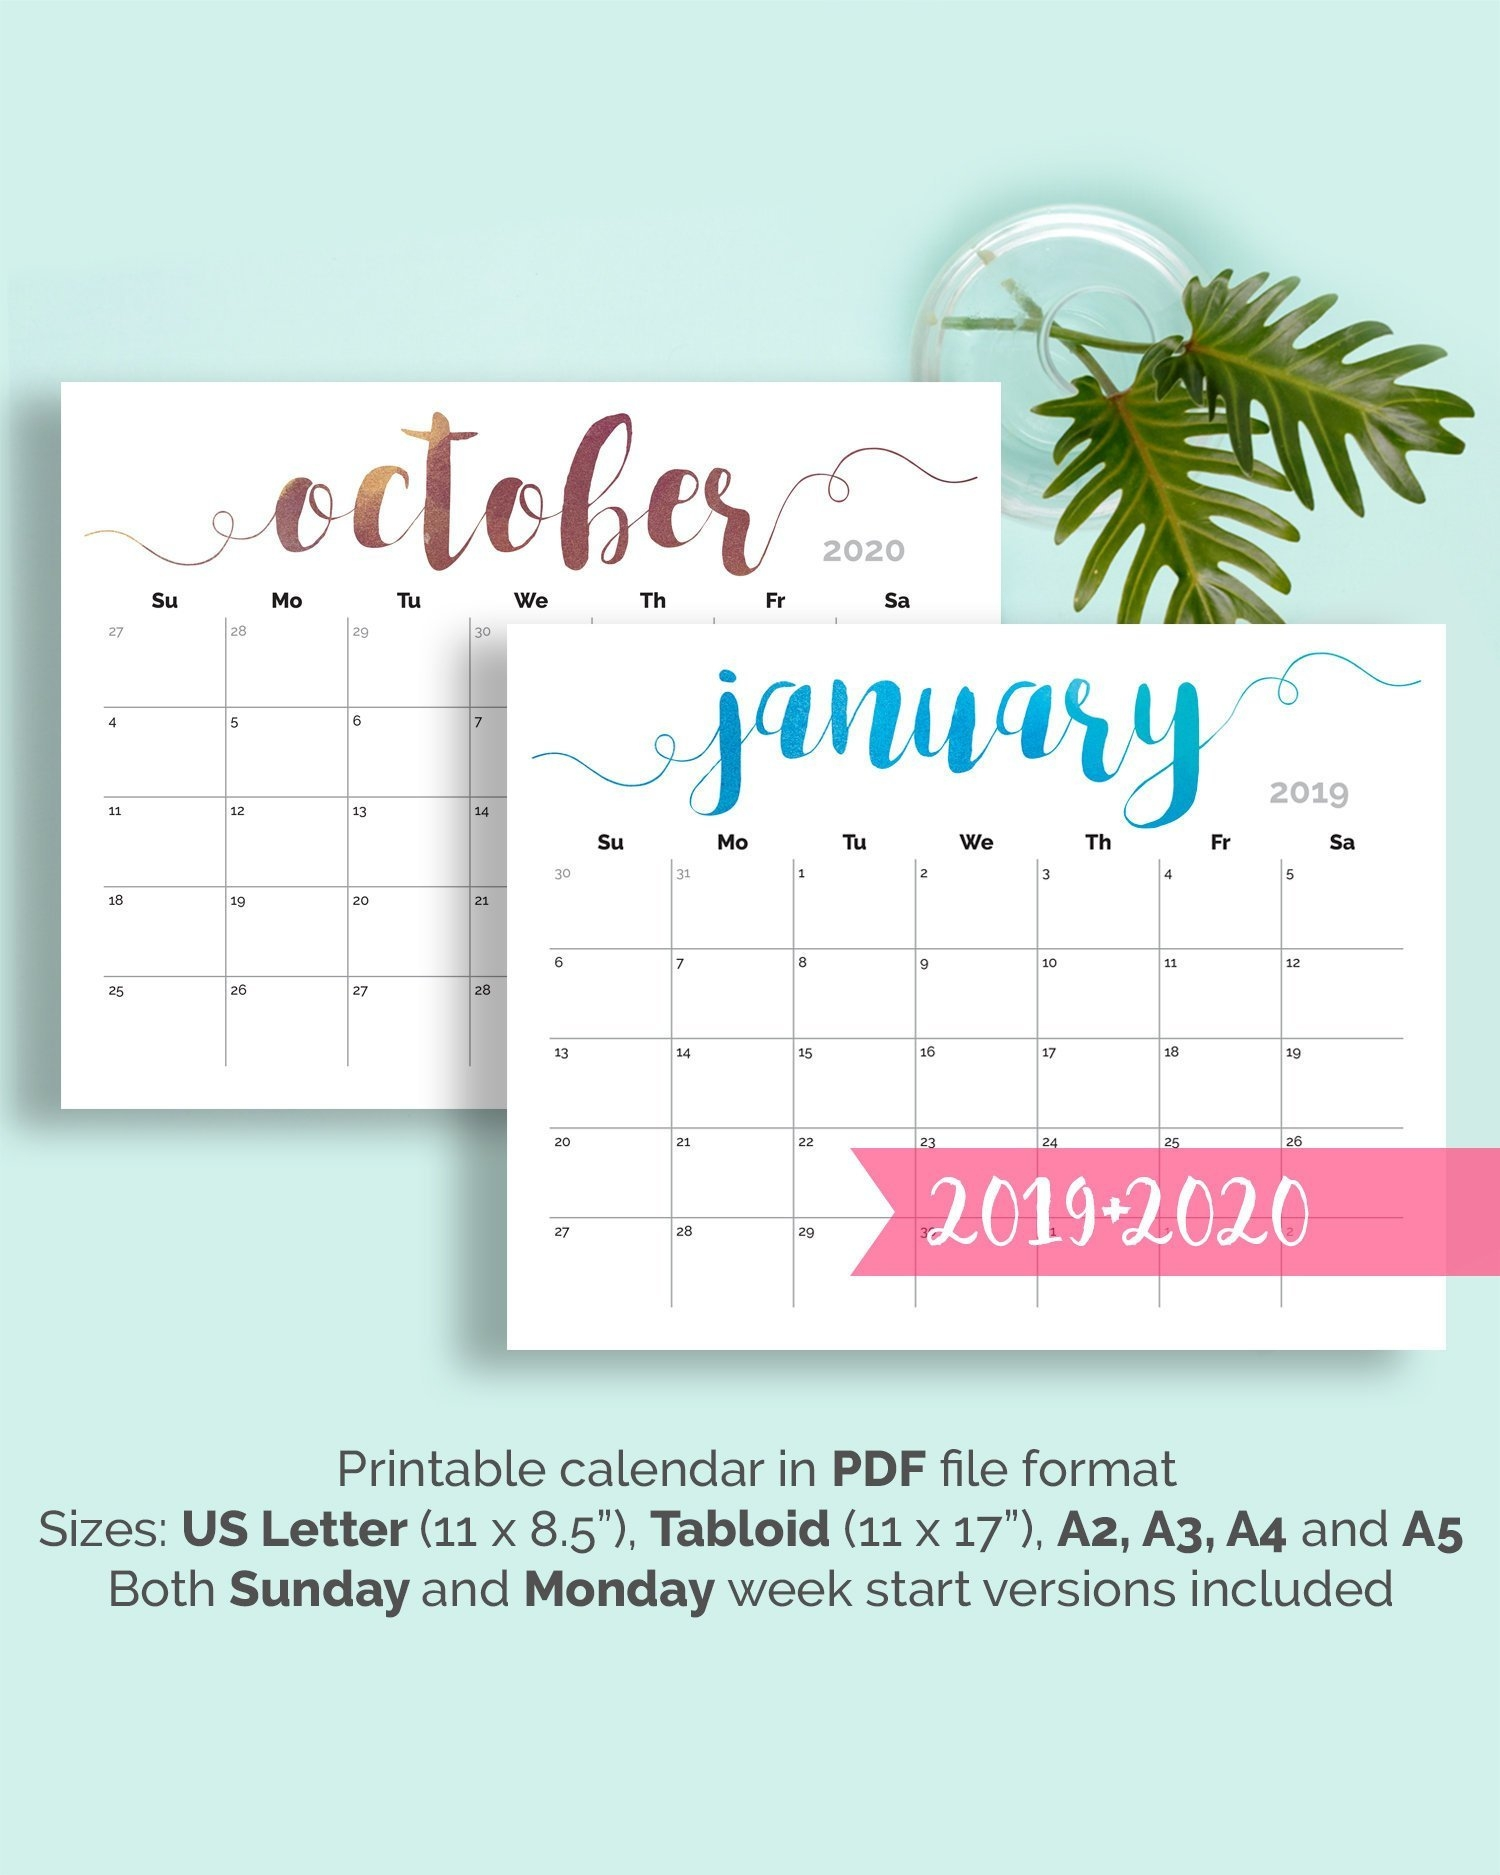 Printable Calendar 2019 Large Wall Calendar 2019-2020 Desk | Etsy School Calendar 2019 Zimbabwe